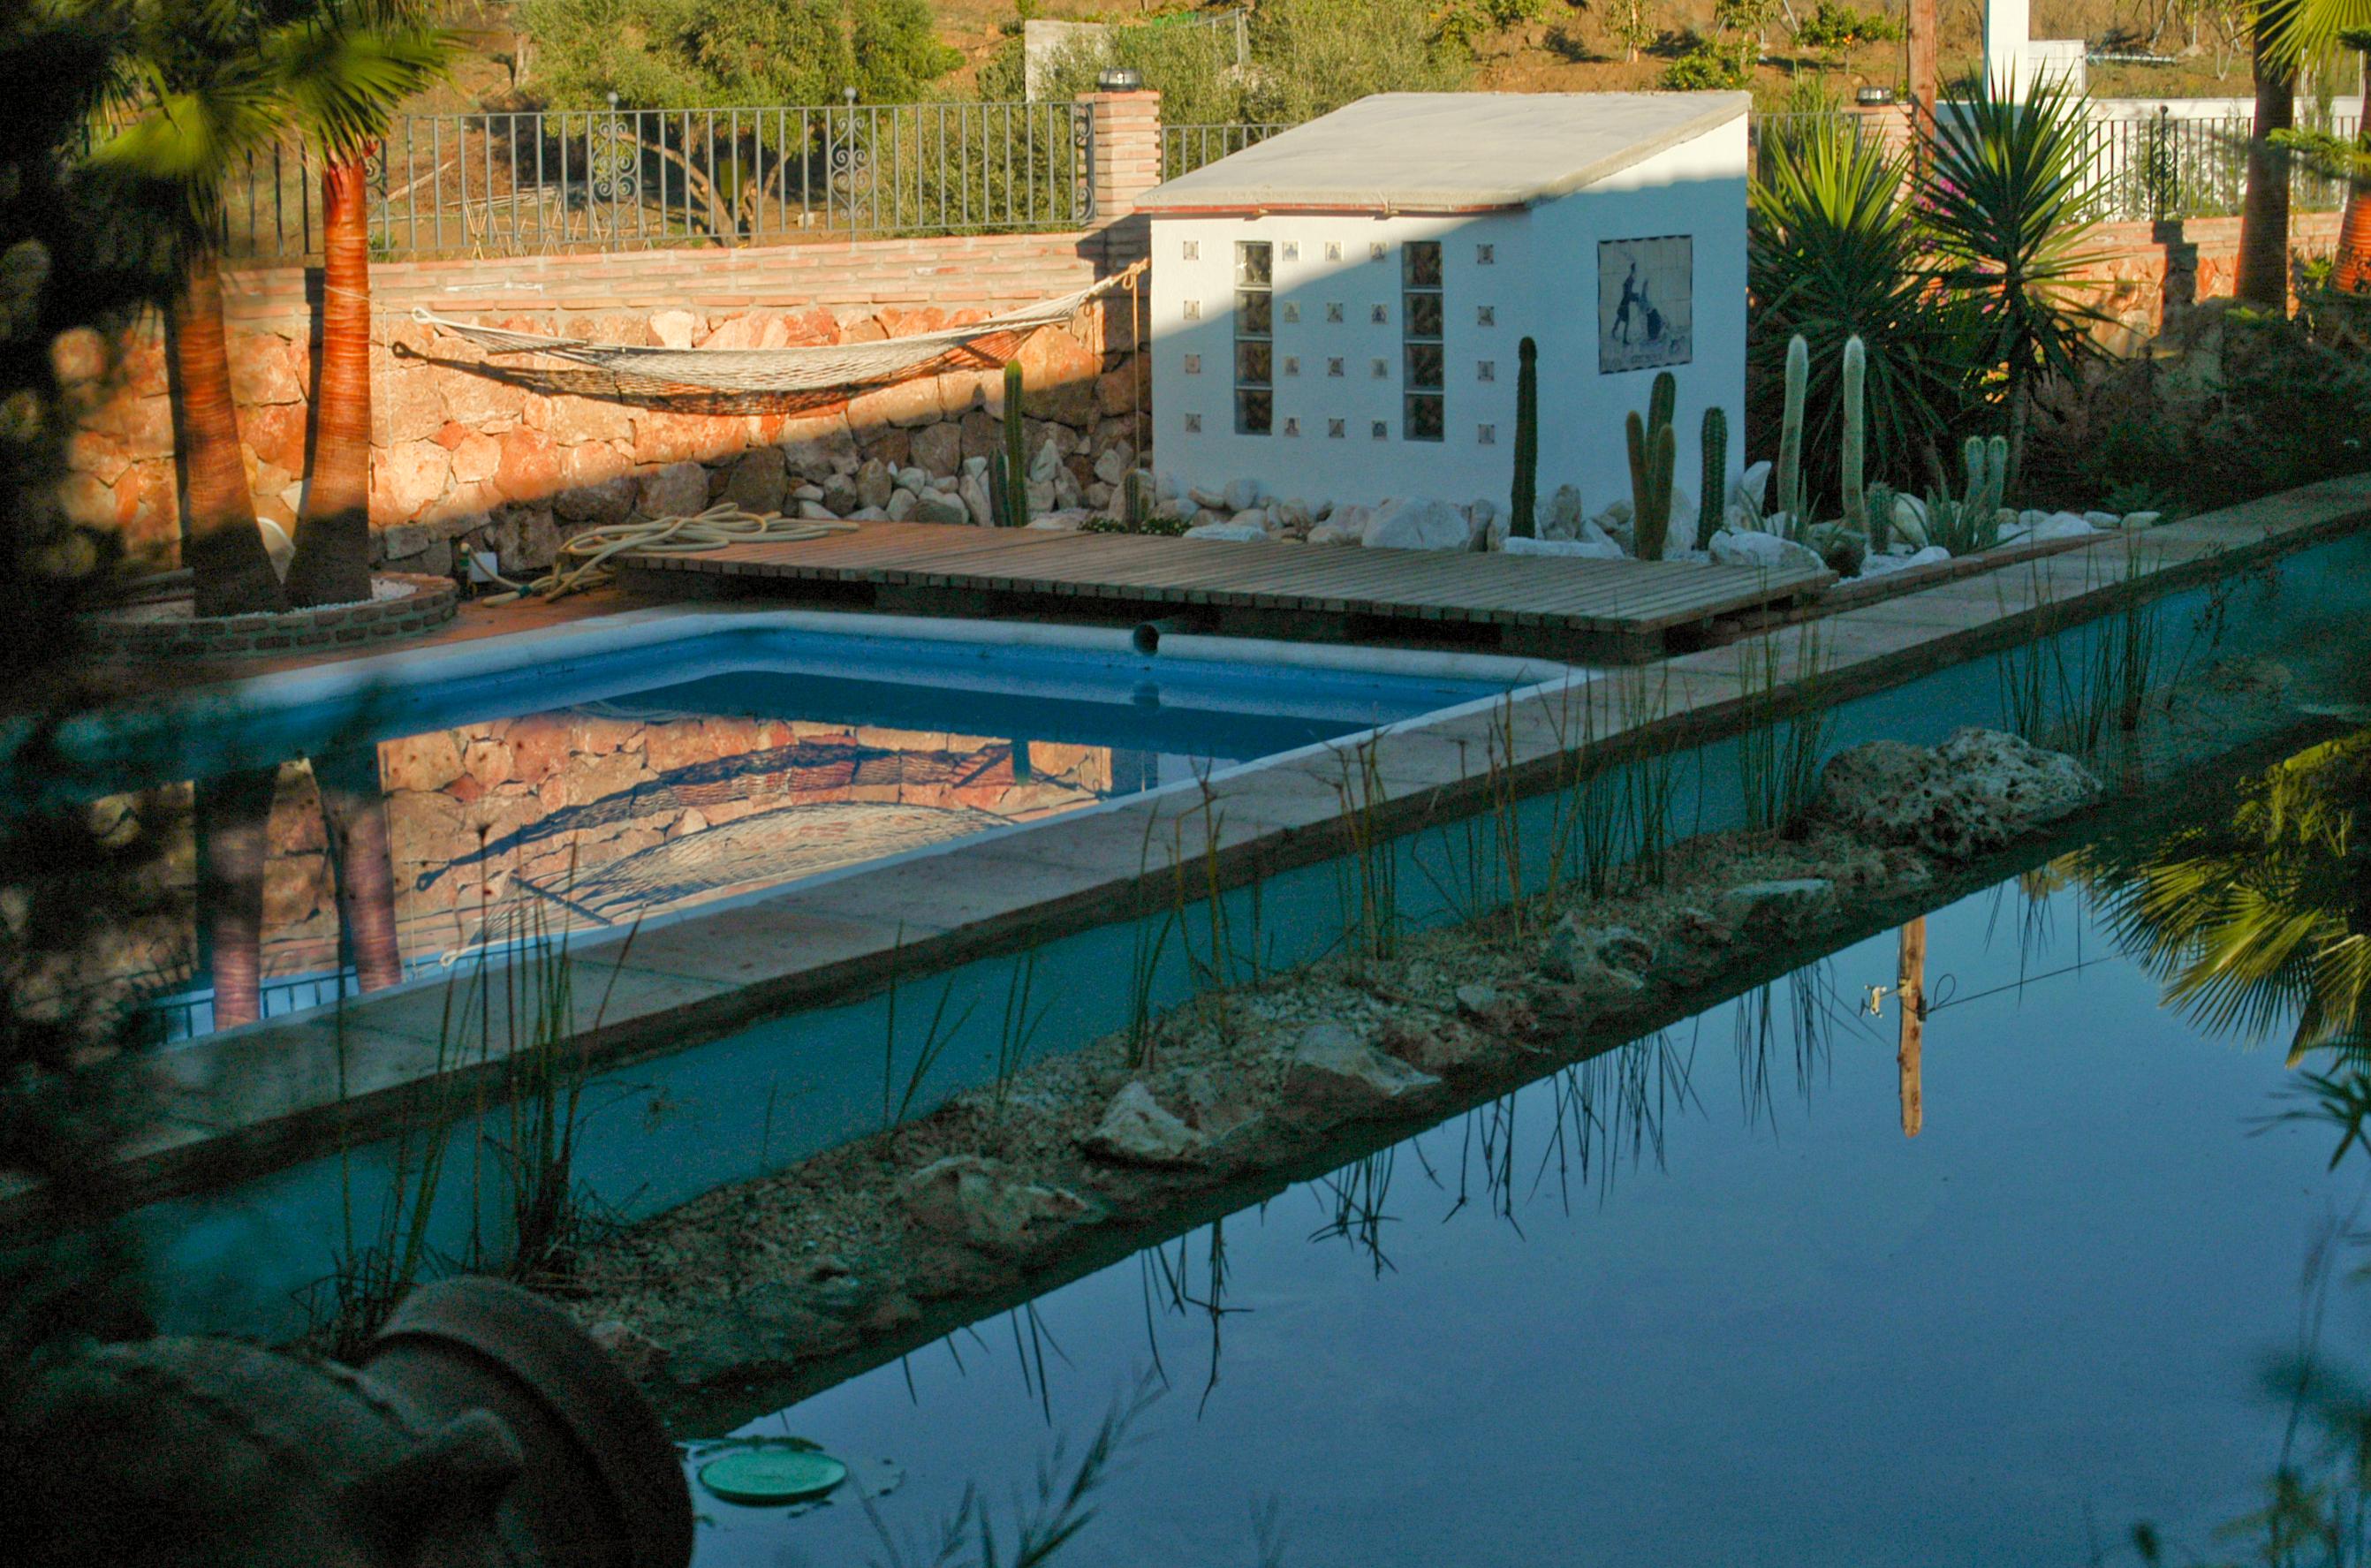 Natur-Pool mit Regenerations-/Bio-Teich